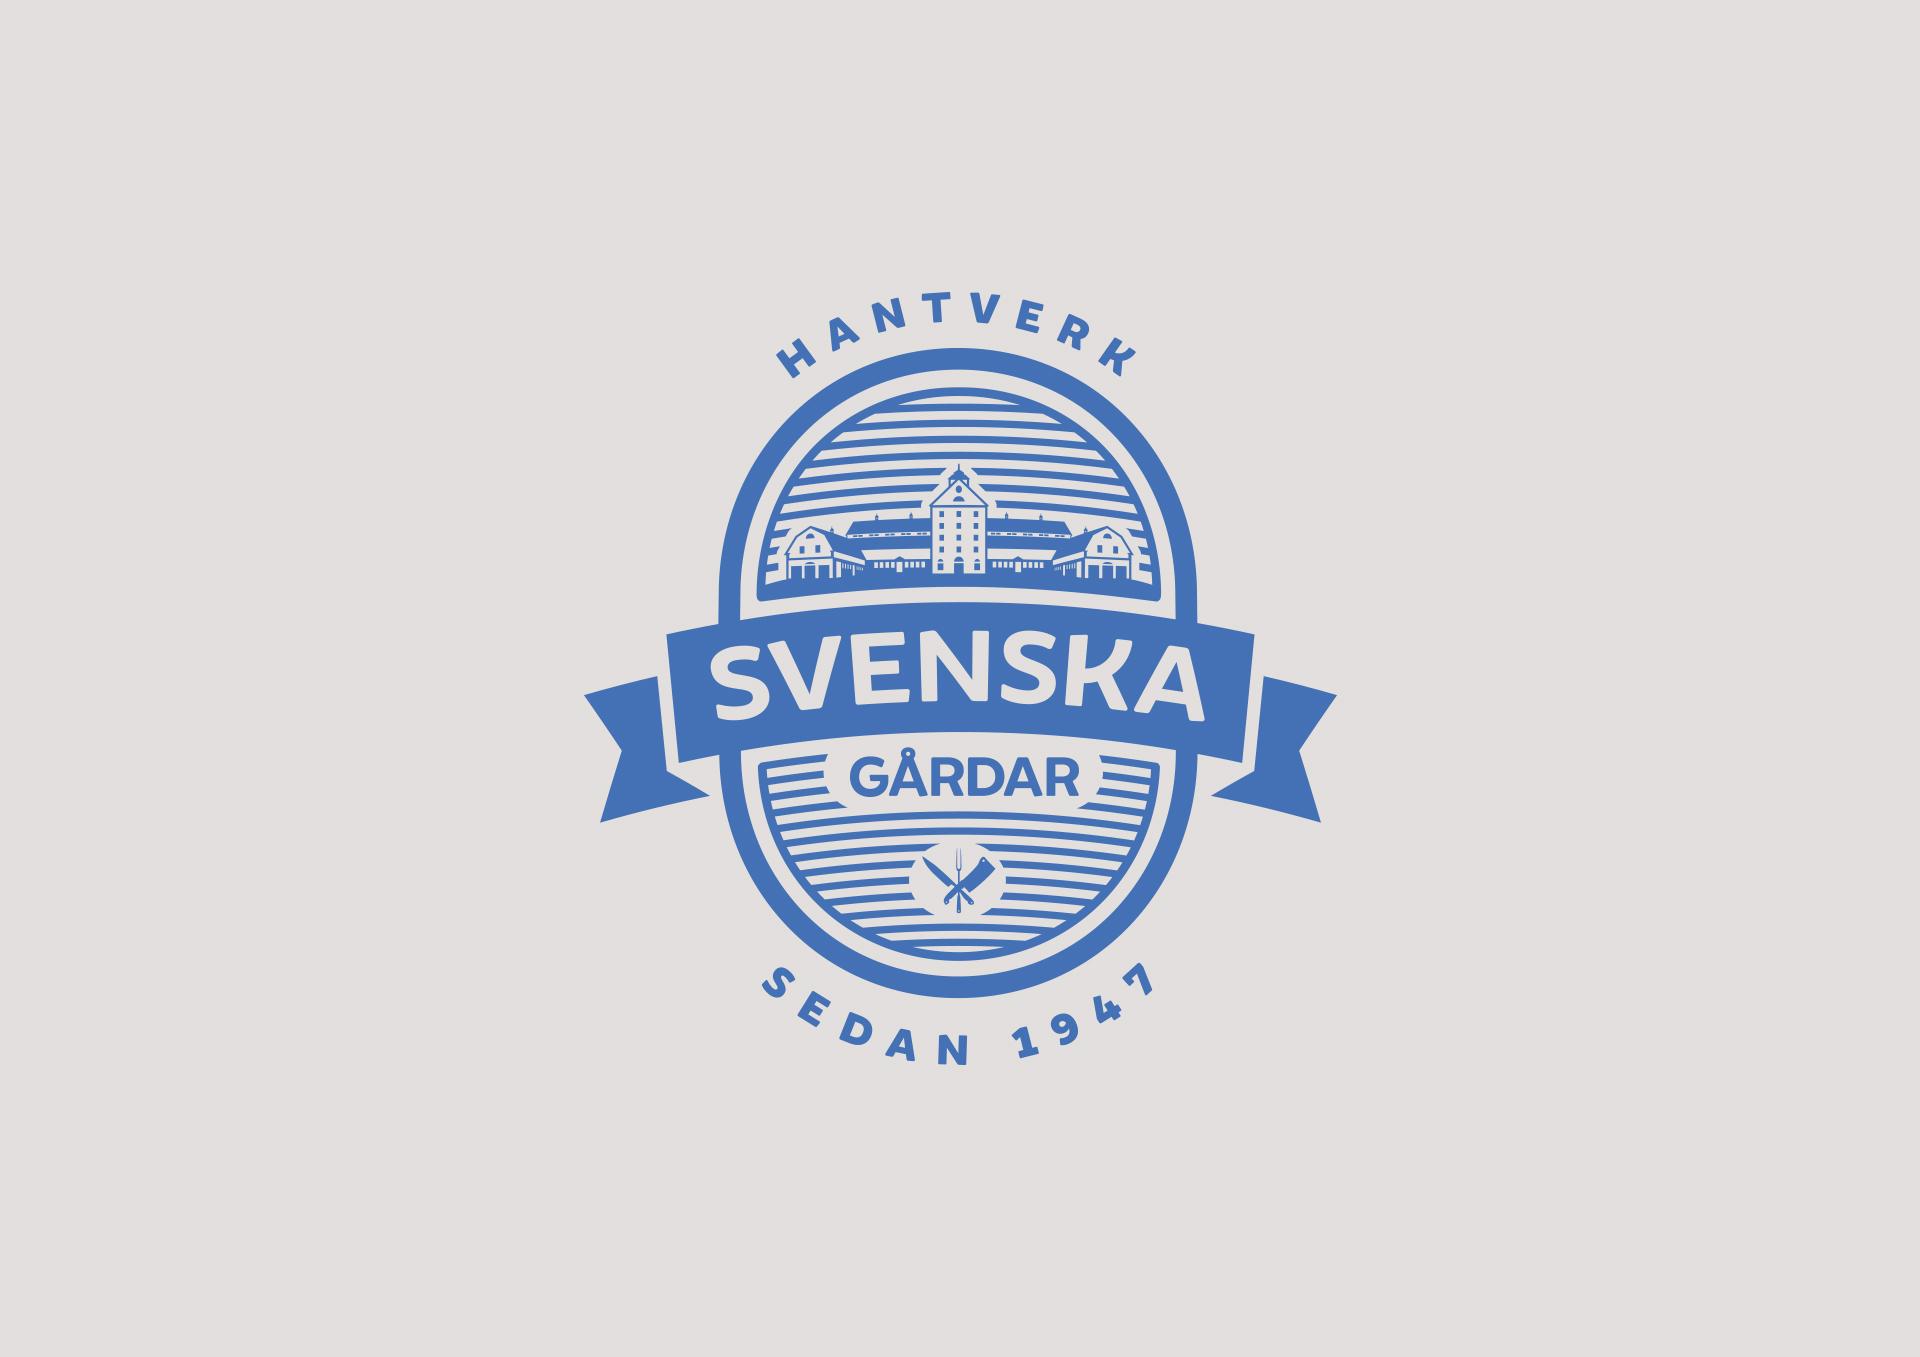 Svenska_Gardar_Case_Image_13_1920x1357